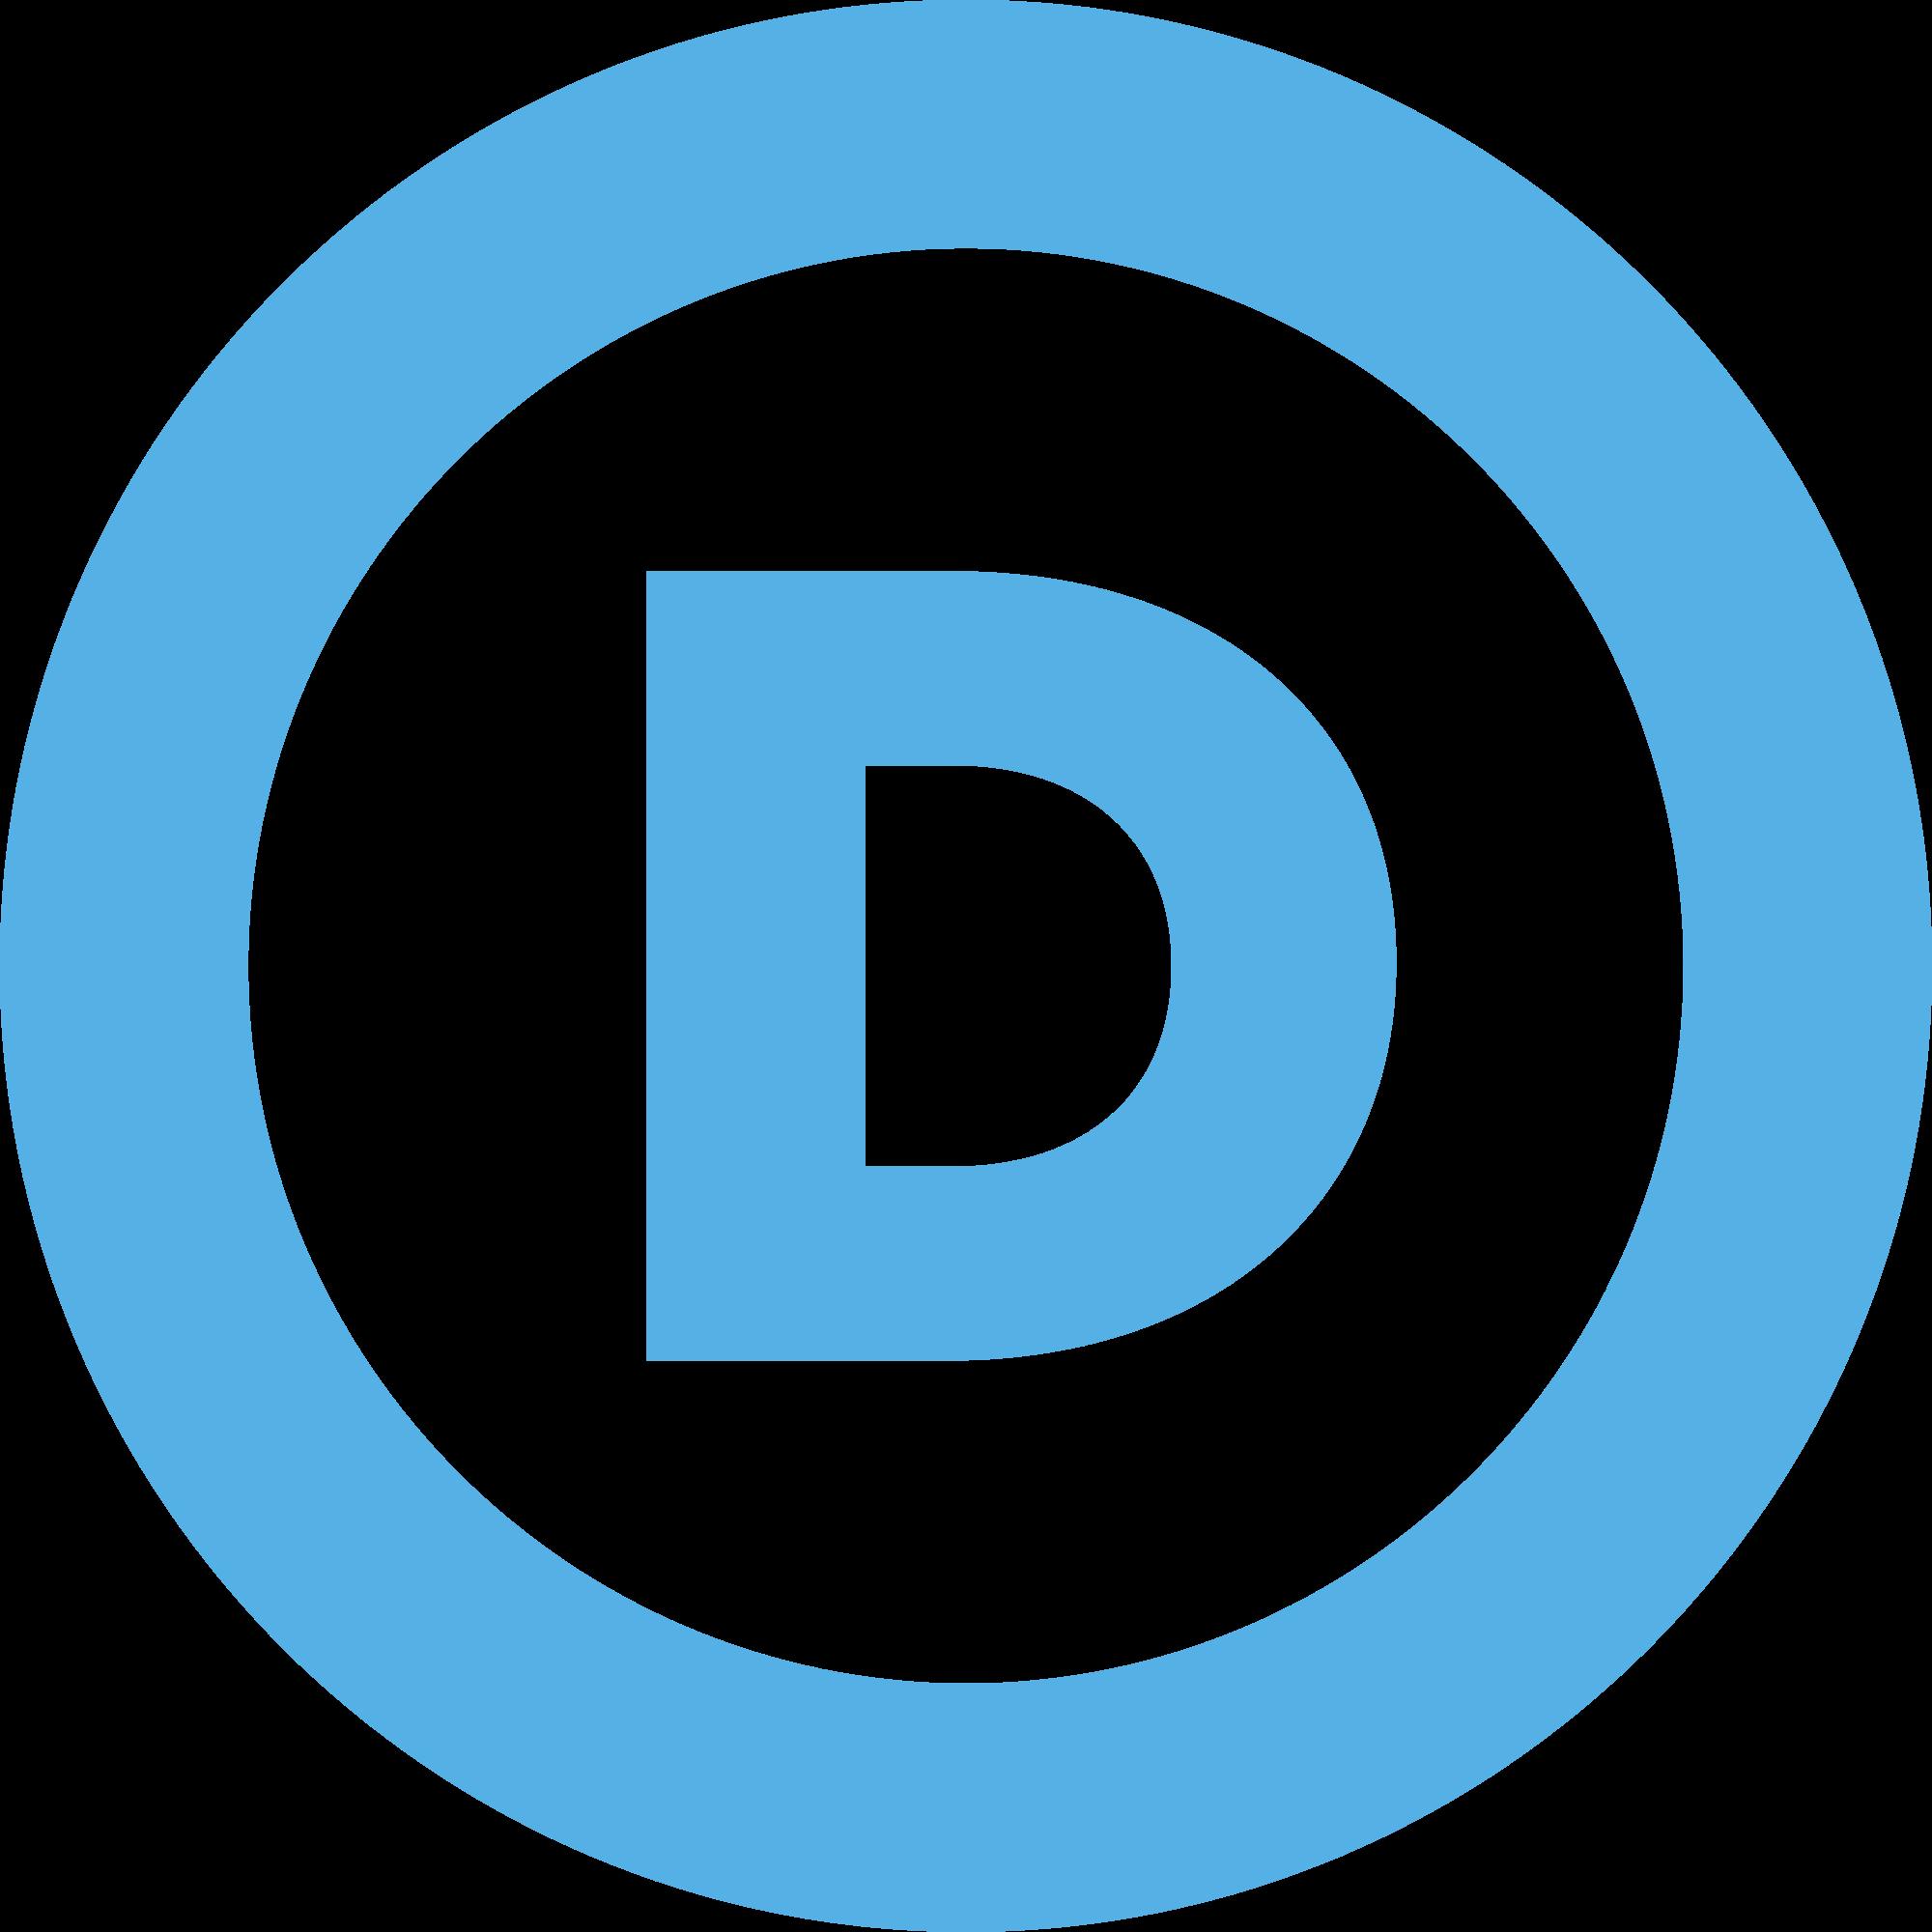 Politics clipart democrat donkey. Somerset county democratic committee